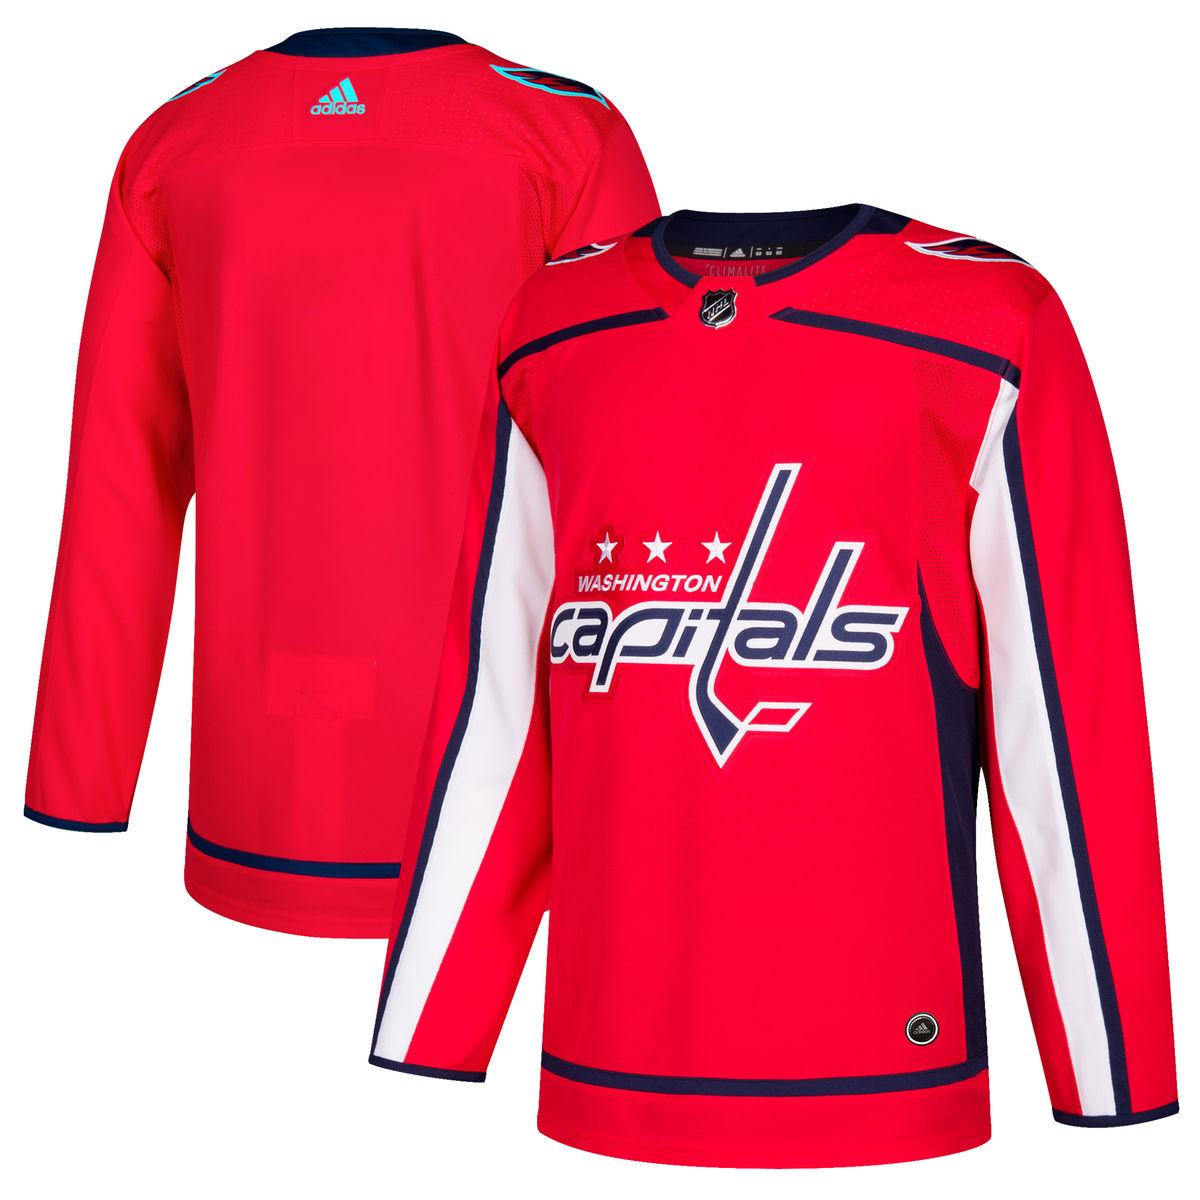 Details about Washington Capitals Jersey Home Adidas Authentic f01d511d451